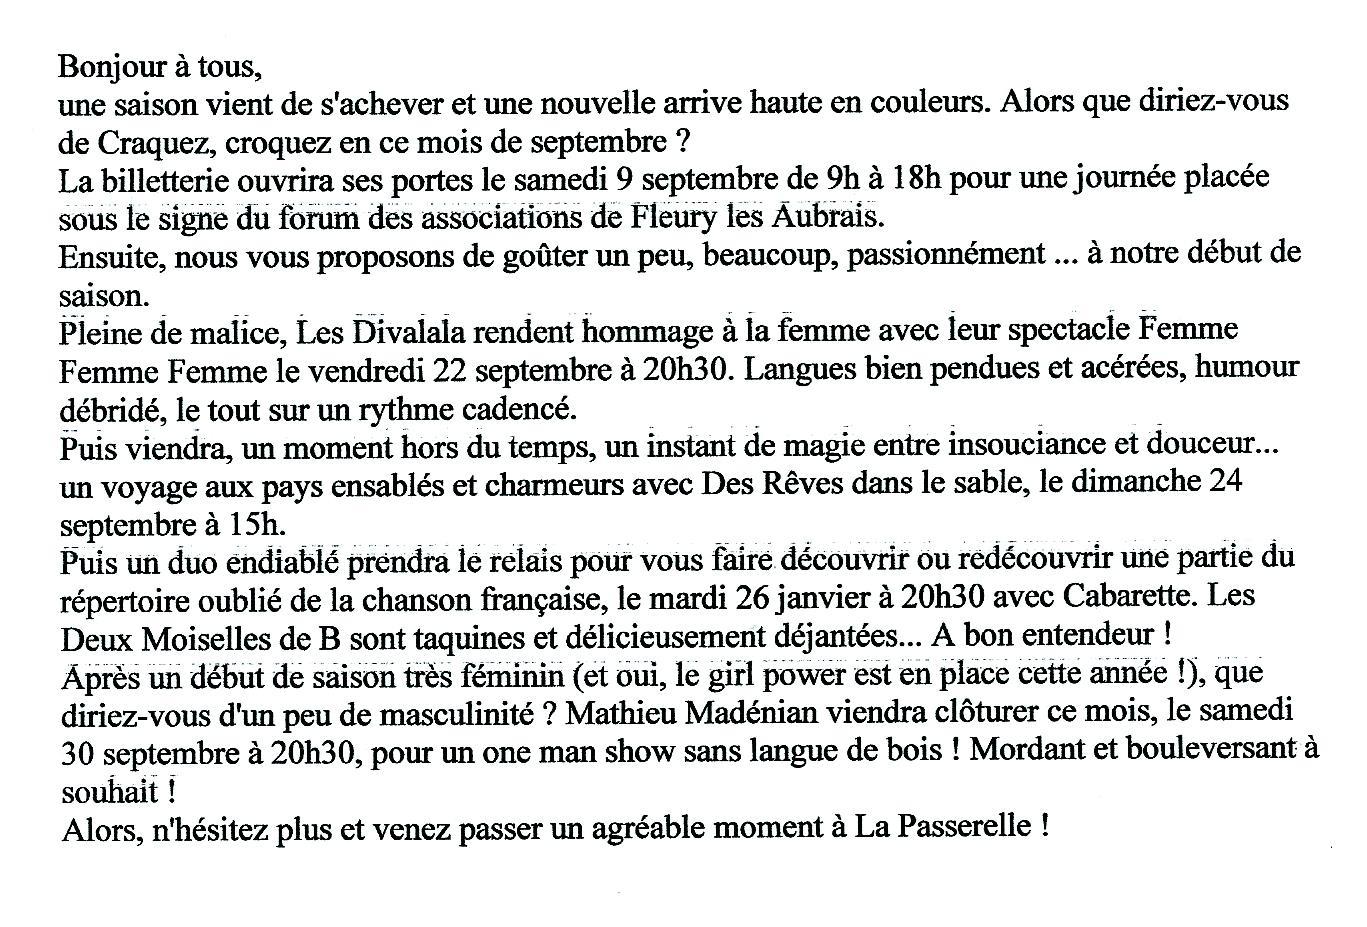 Scan La Passerelle Texte Saison 2017 - 2018 (04.09.2017).jpg